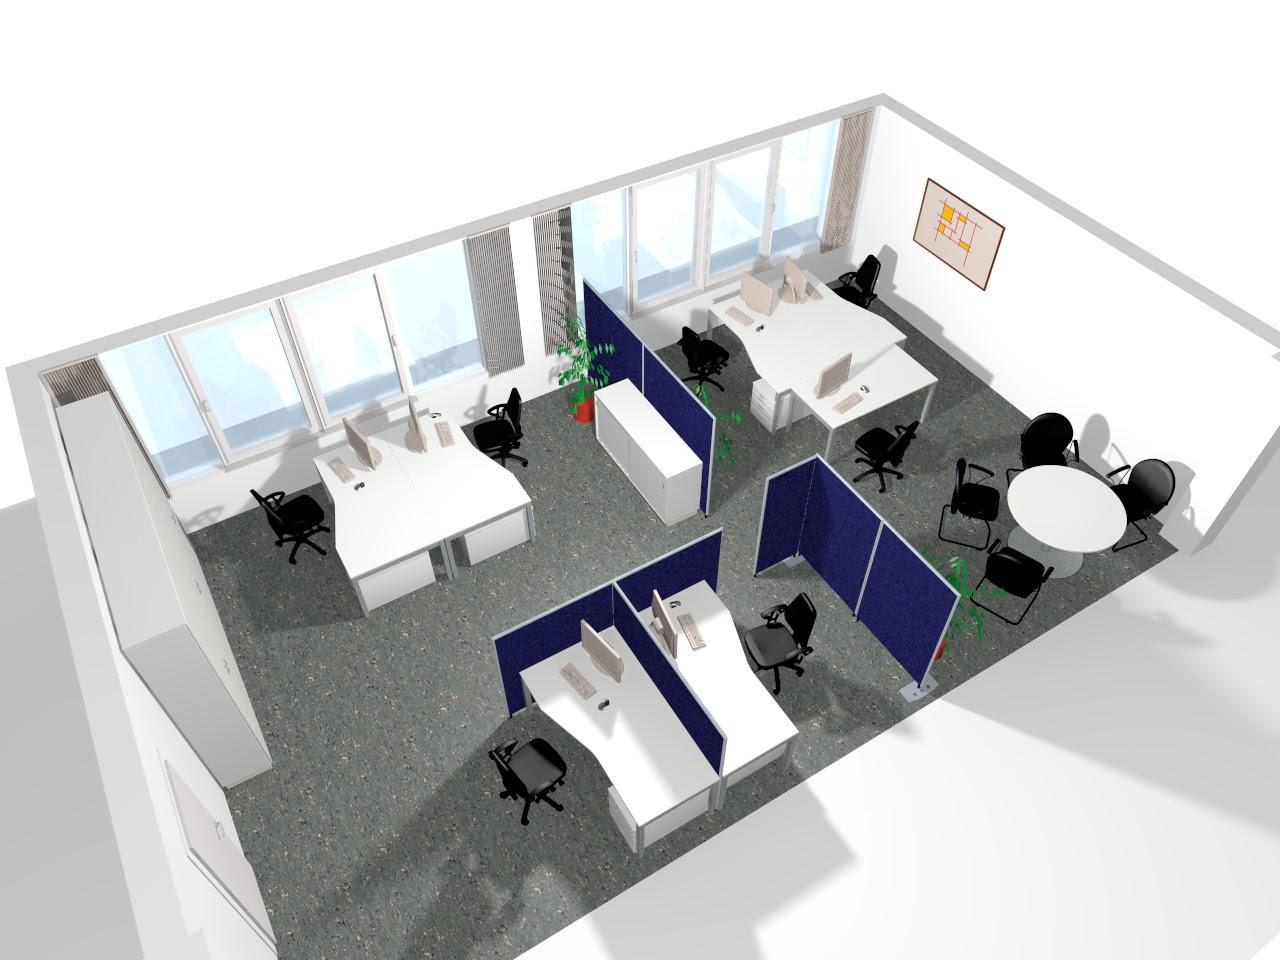 Schön Büromöbel Planer Fotos - Hauptinnenideen - kakados.com